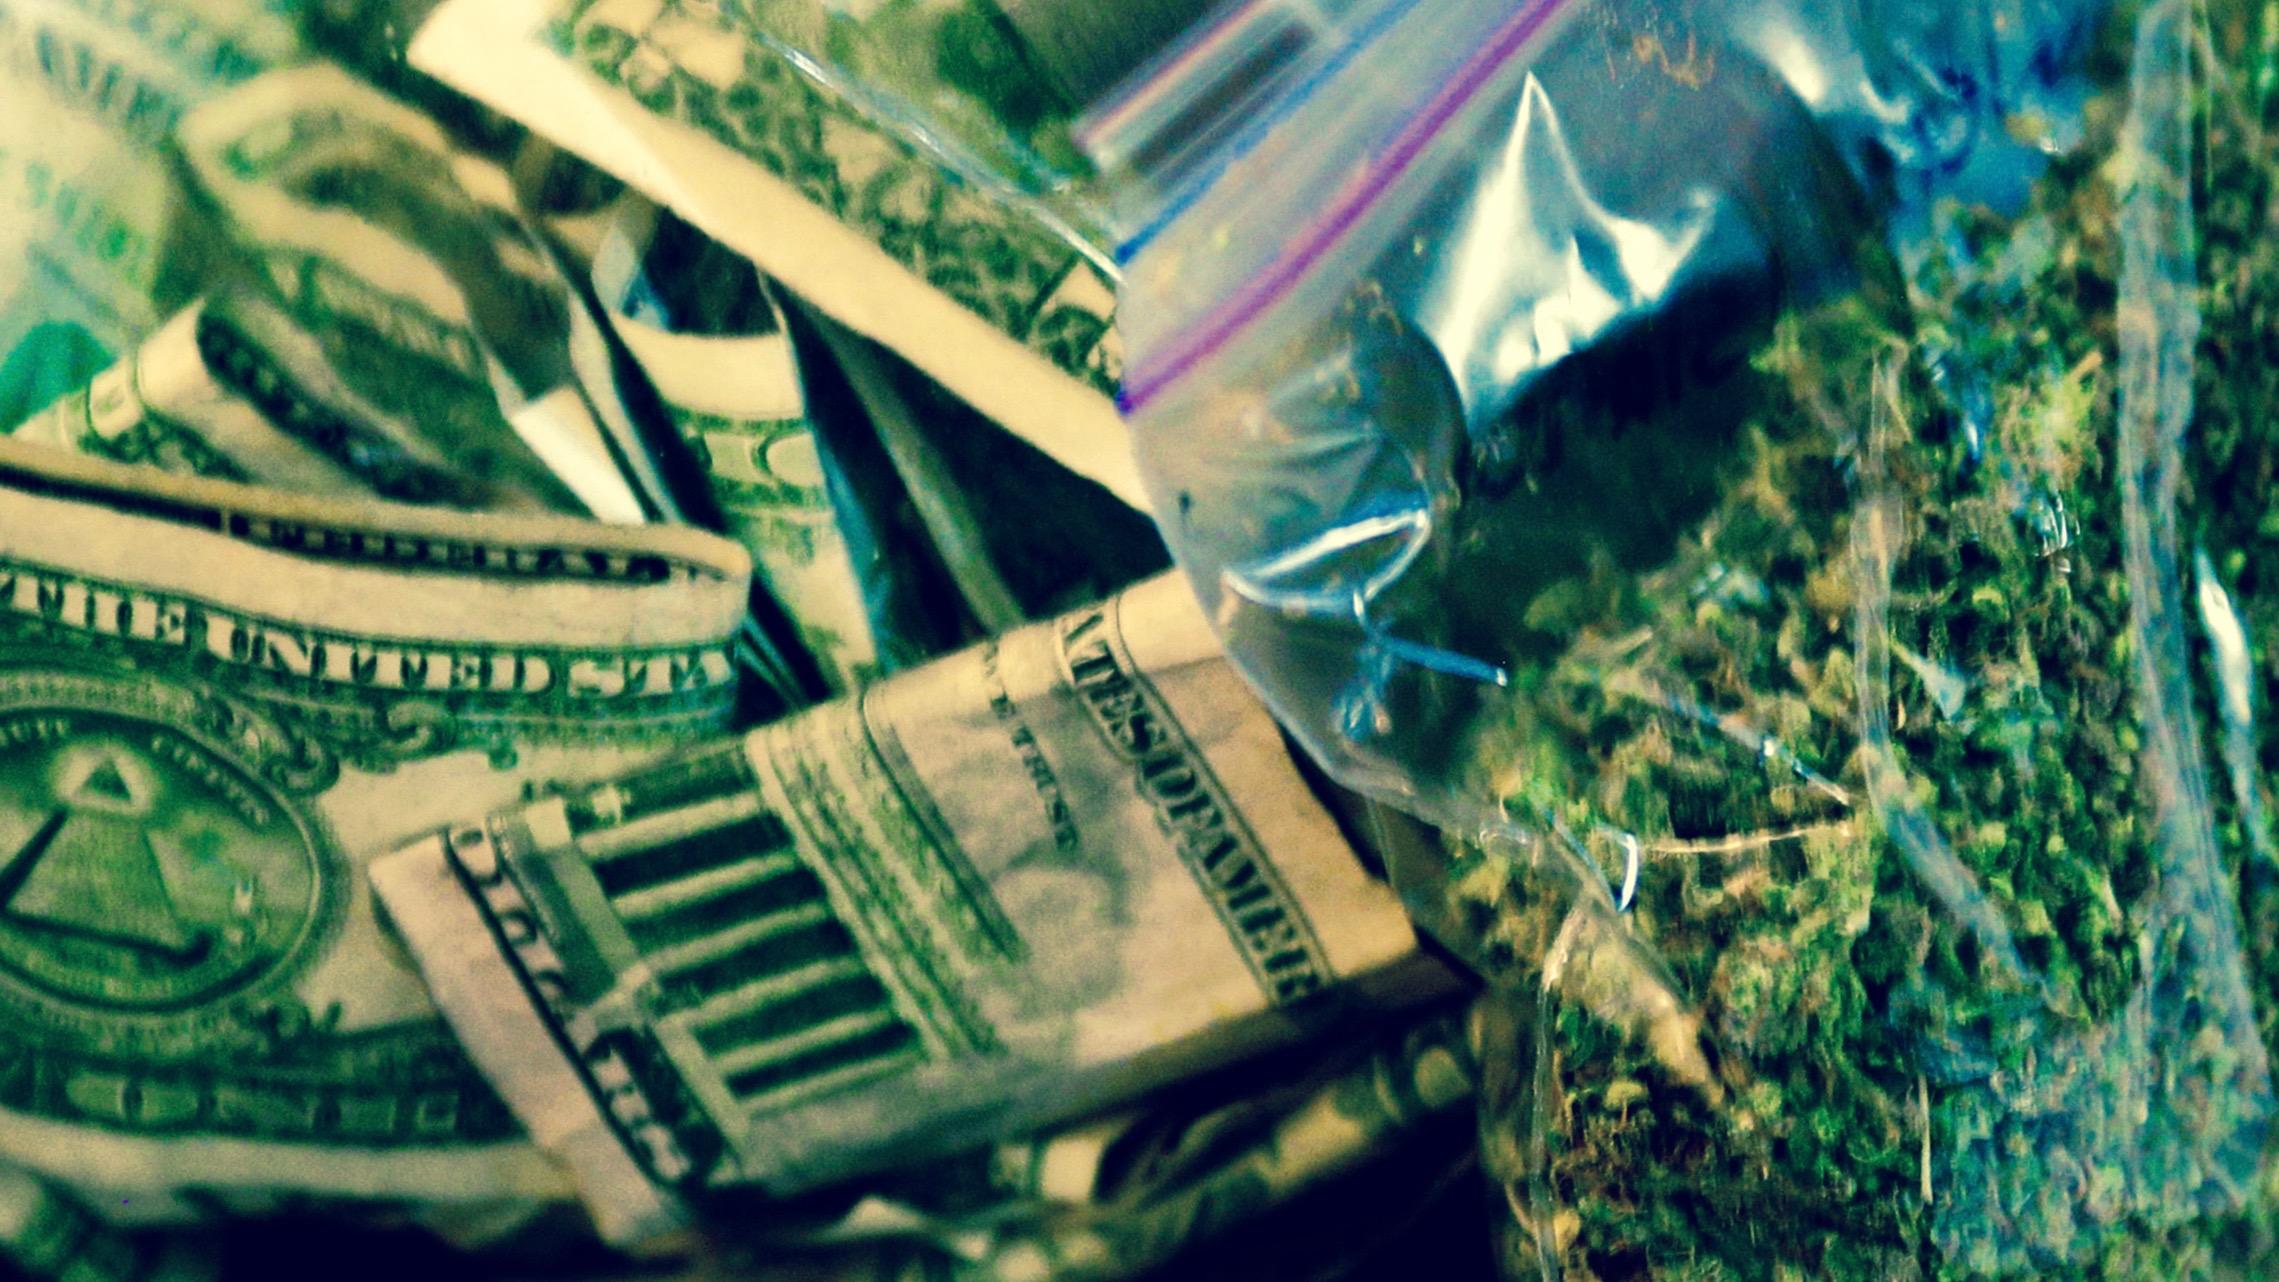 Marijuana and cash.